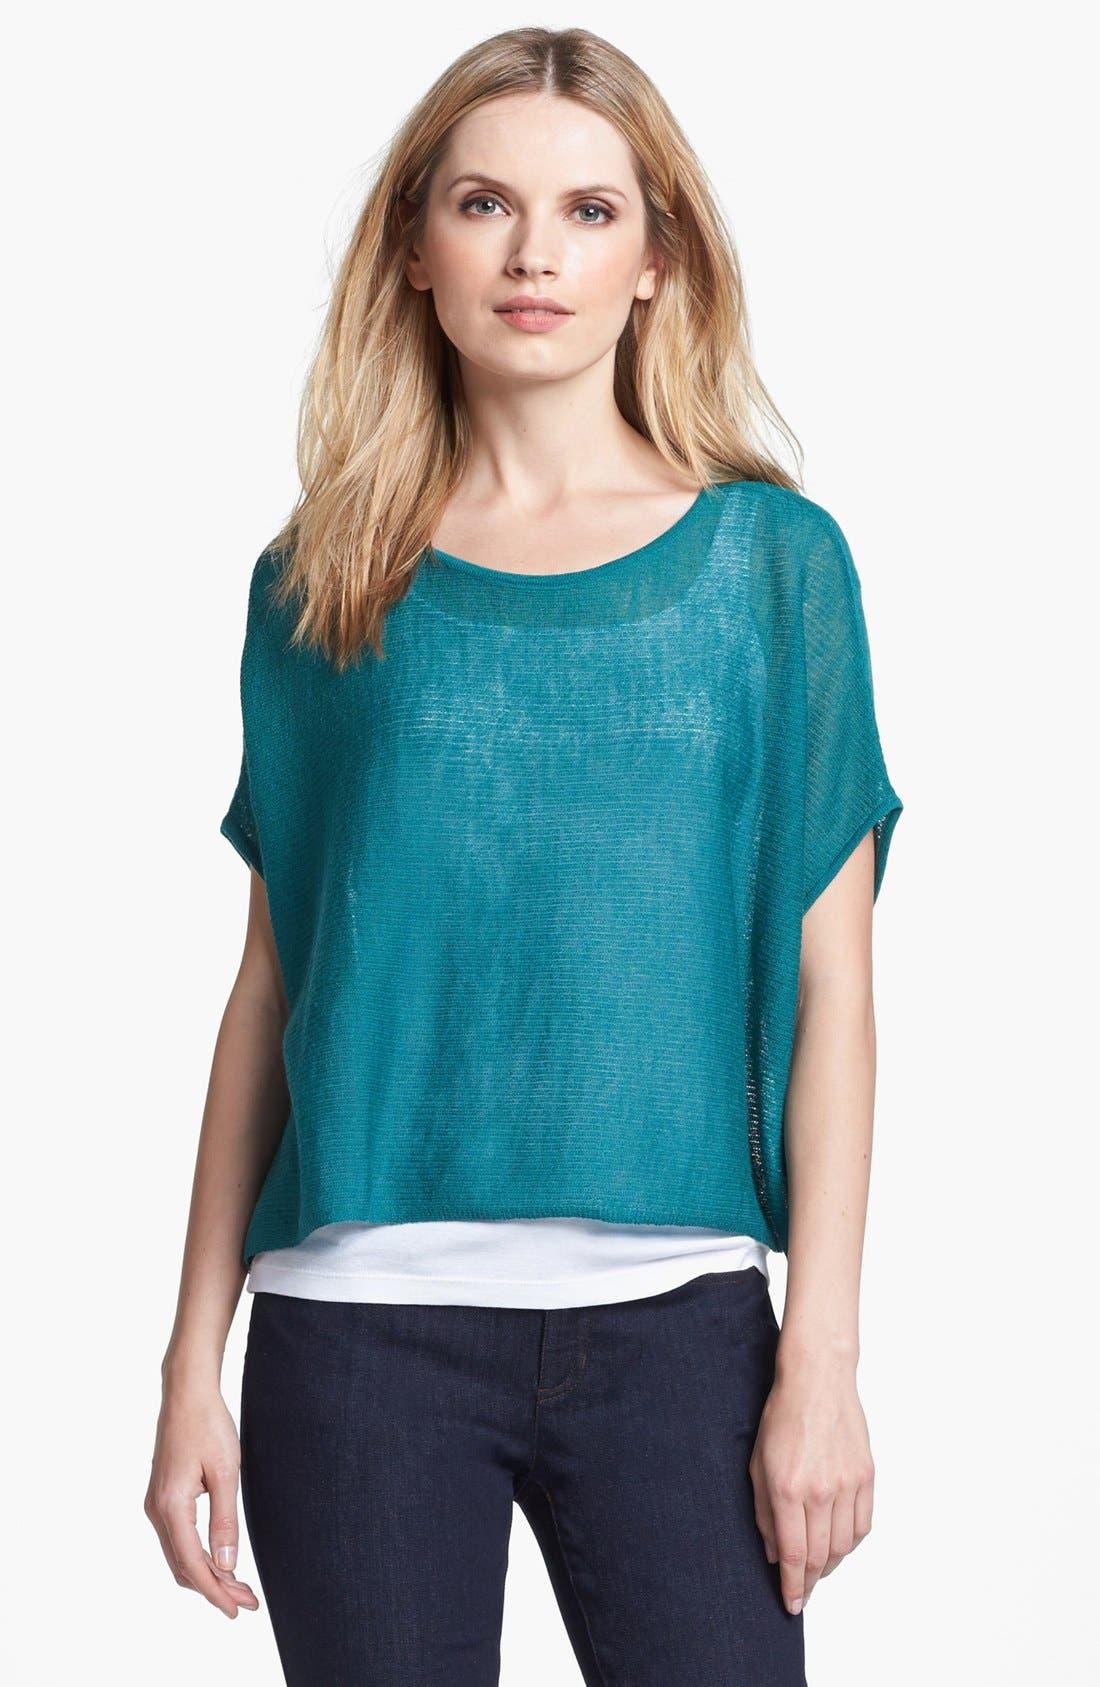 Alternate Image 1 Selected - Eileen Fisher 'Ethereal Wool' Short Poncho Top (Regular & Petite)